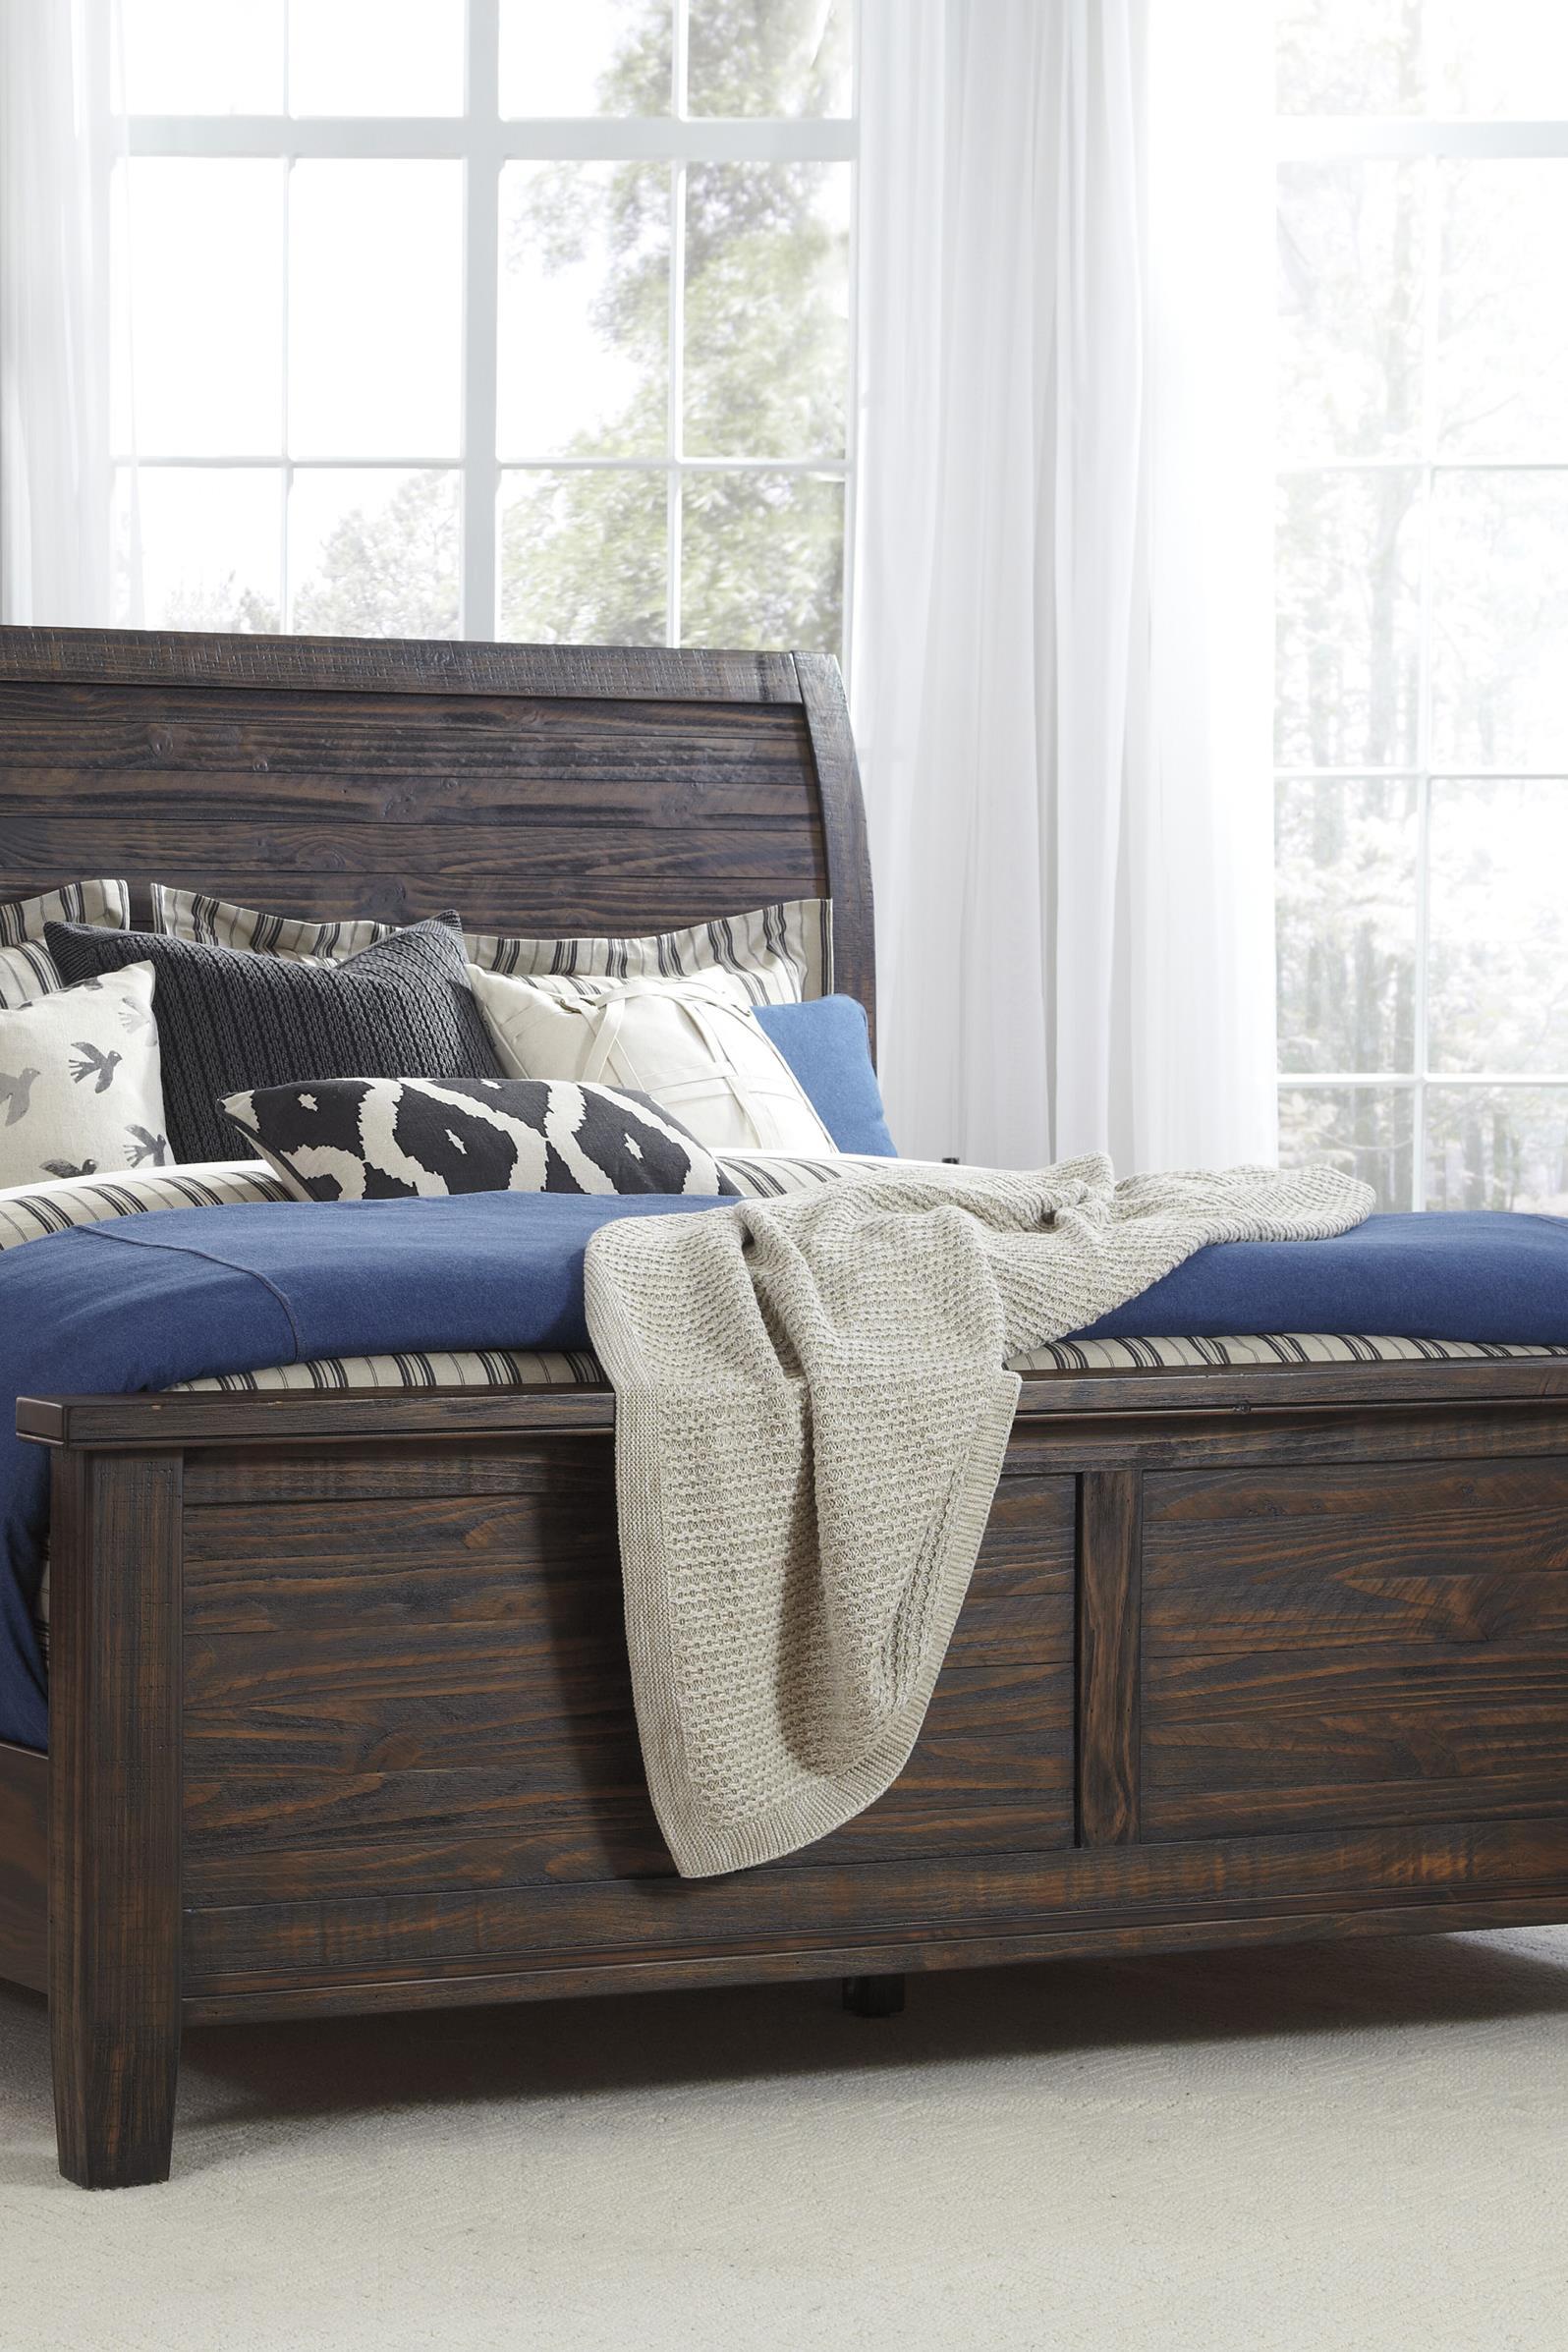 Trudell B658 By Signature Design By Ashley Del Sol Furniture Signature Design By Ashley